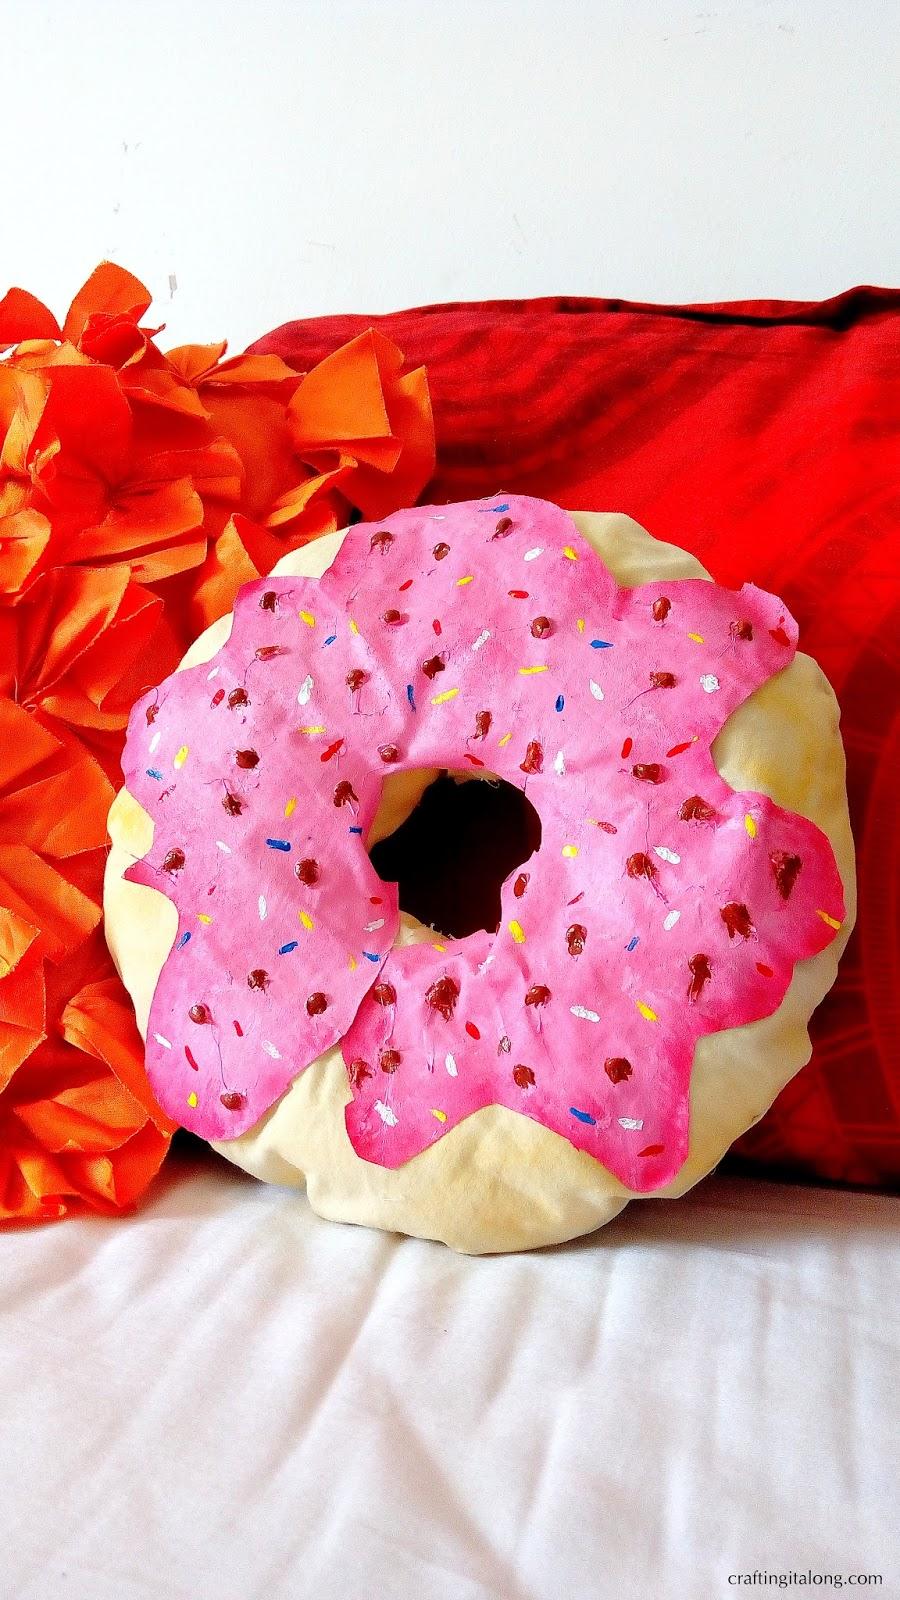 DIY Donut Pillow- No Sew & DIY Donut Pillow- No Sew ~ CRAFTING IT ALONG pillowsntoast.com